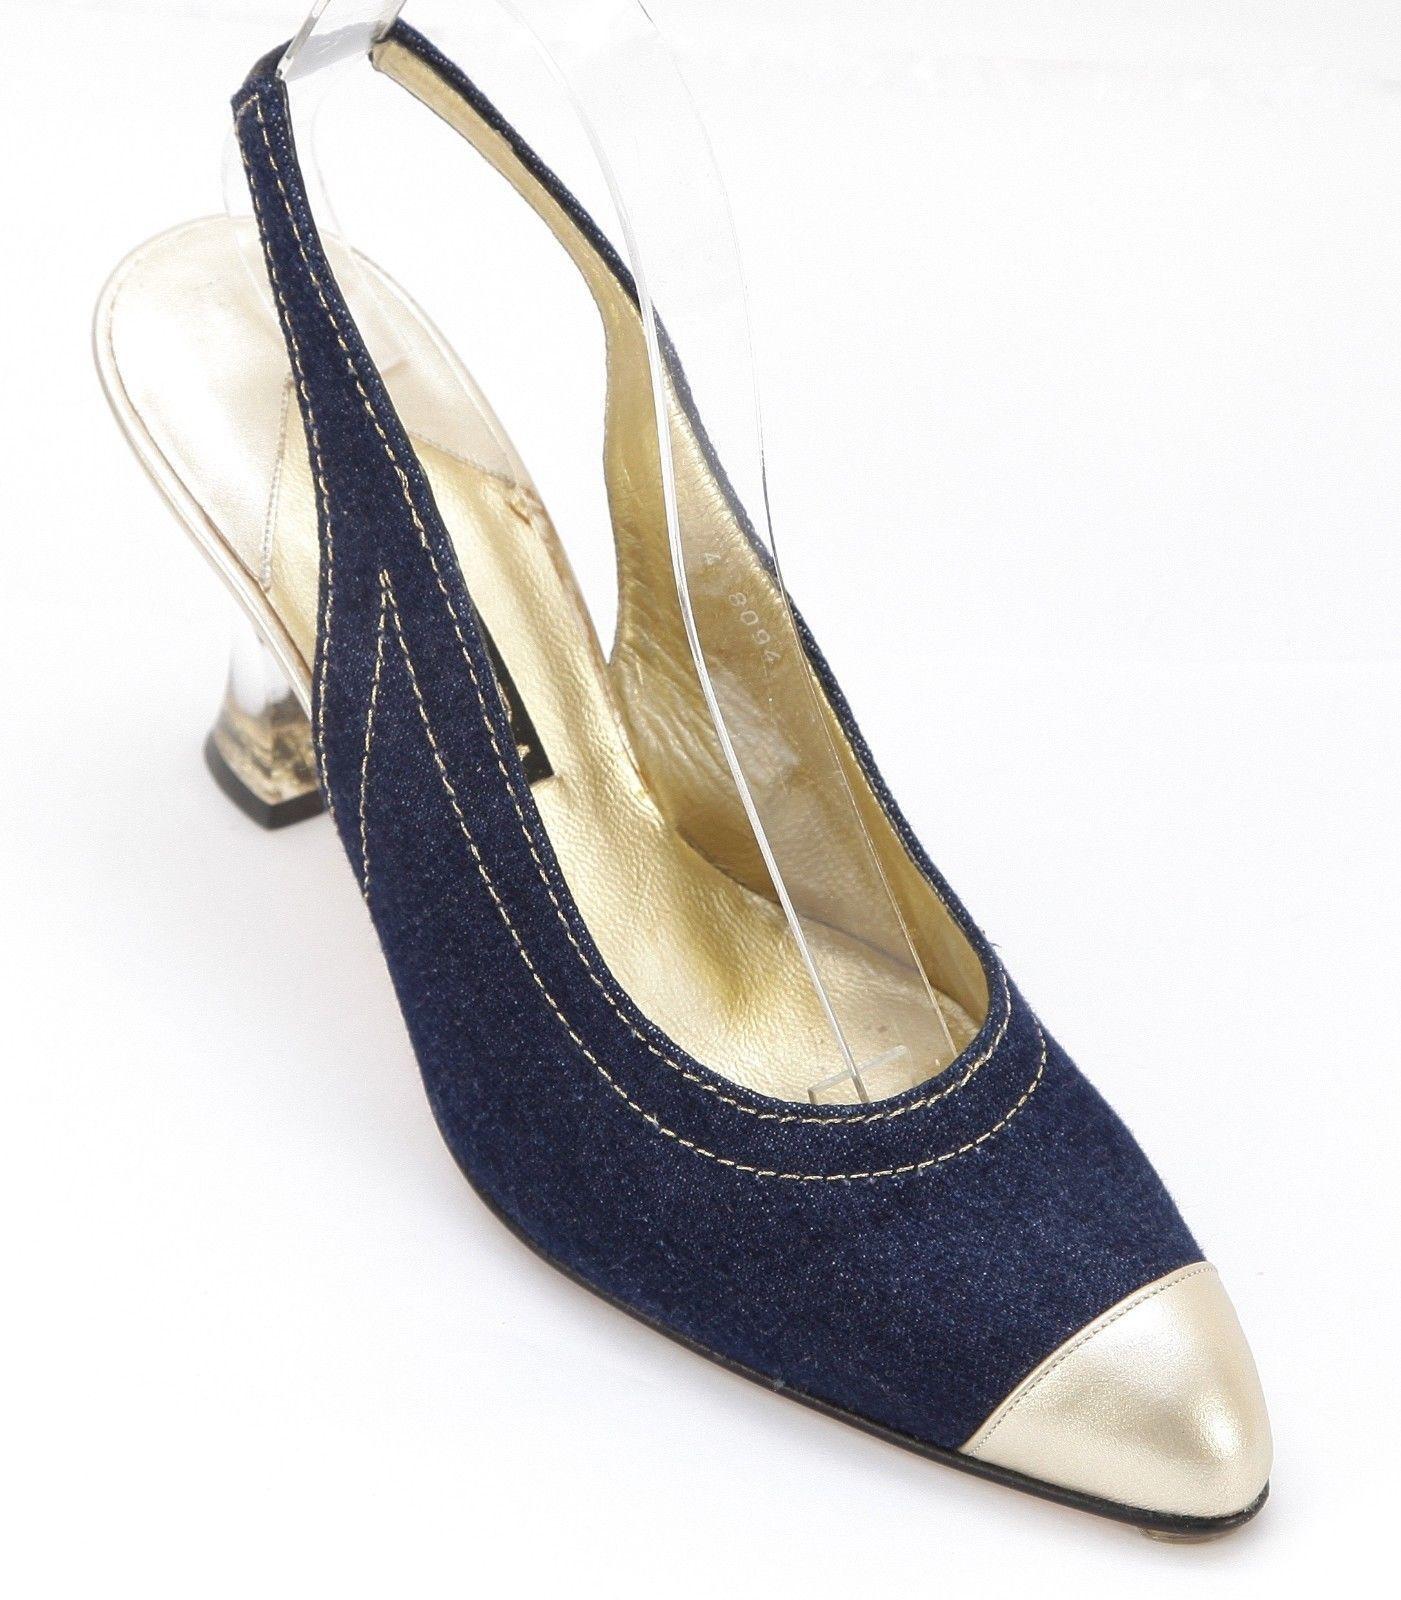 l'ultimo ESCADA Pump blu Leather Slingback oro Resin Heel scarpe 7B 7B 7B VINTAGE  prezzi più convenienti